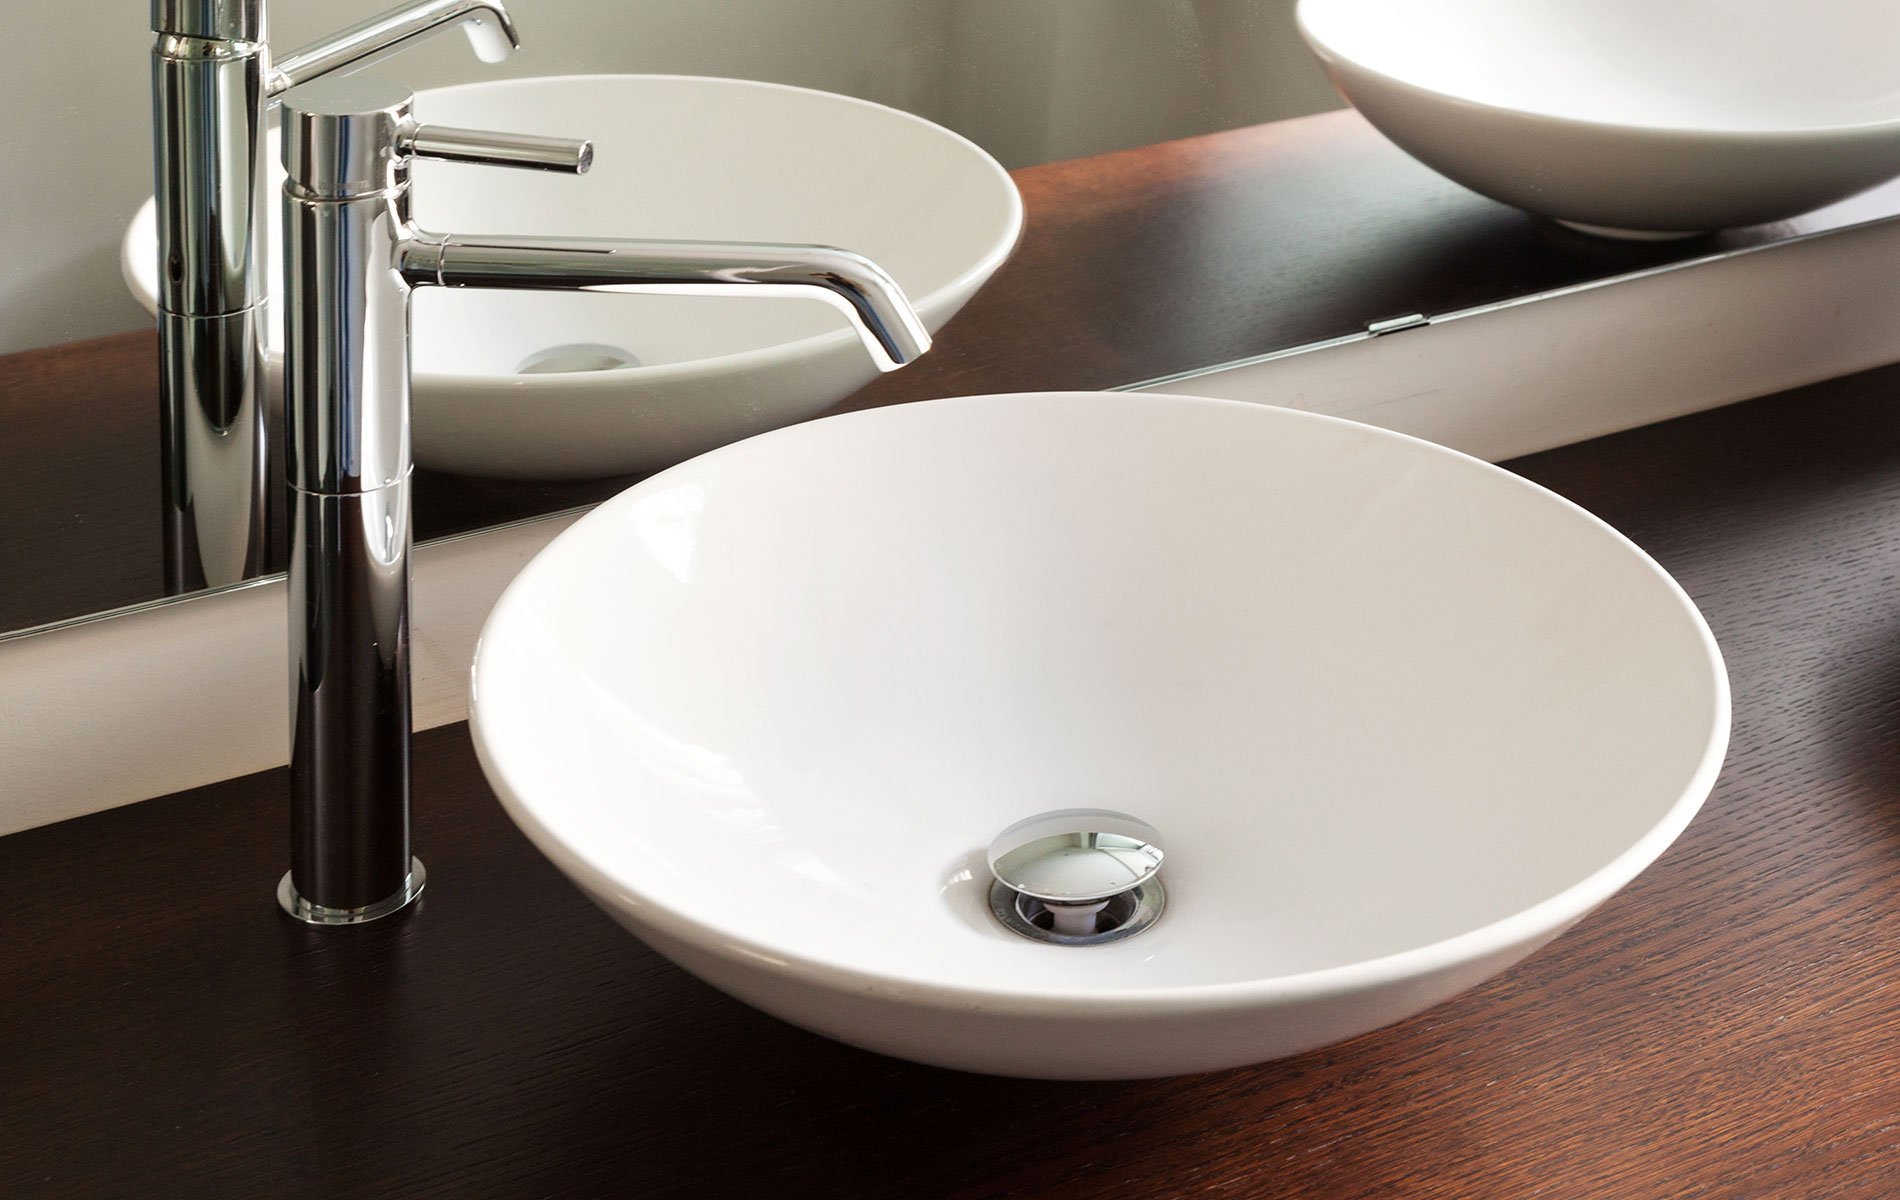 Professional Plumbing Solutions